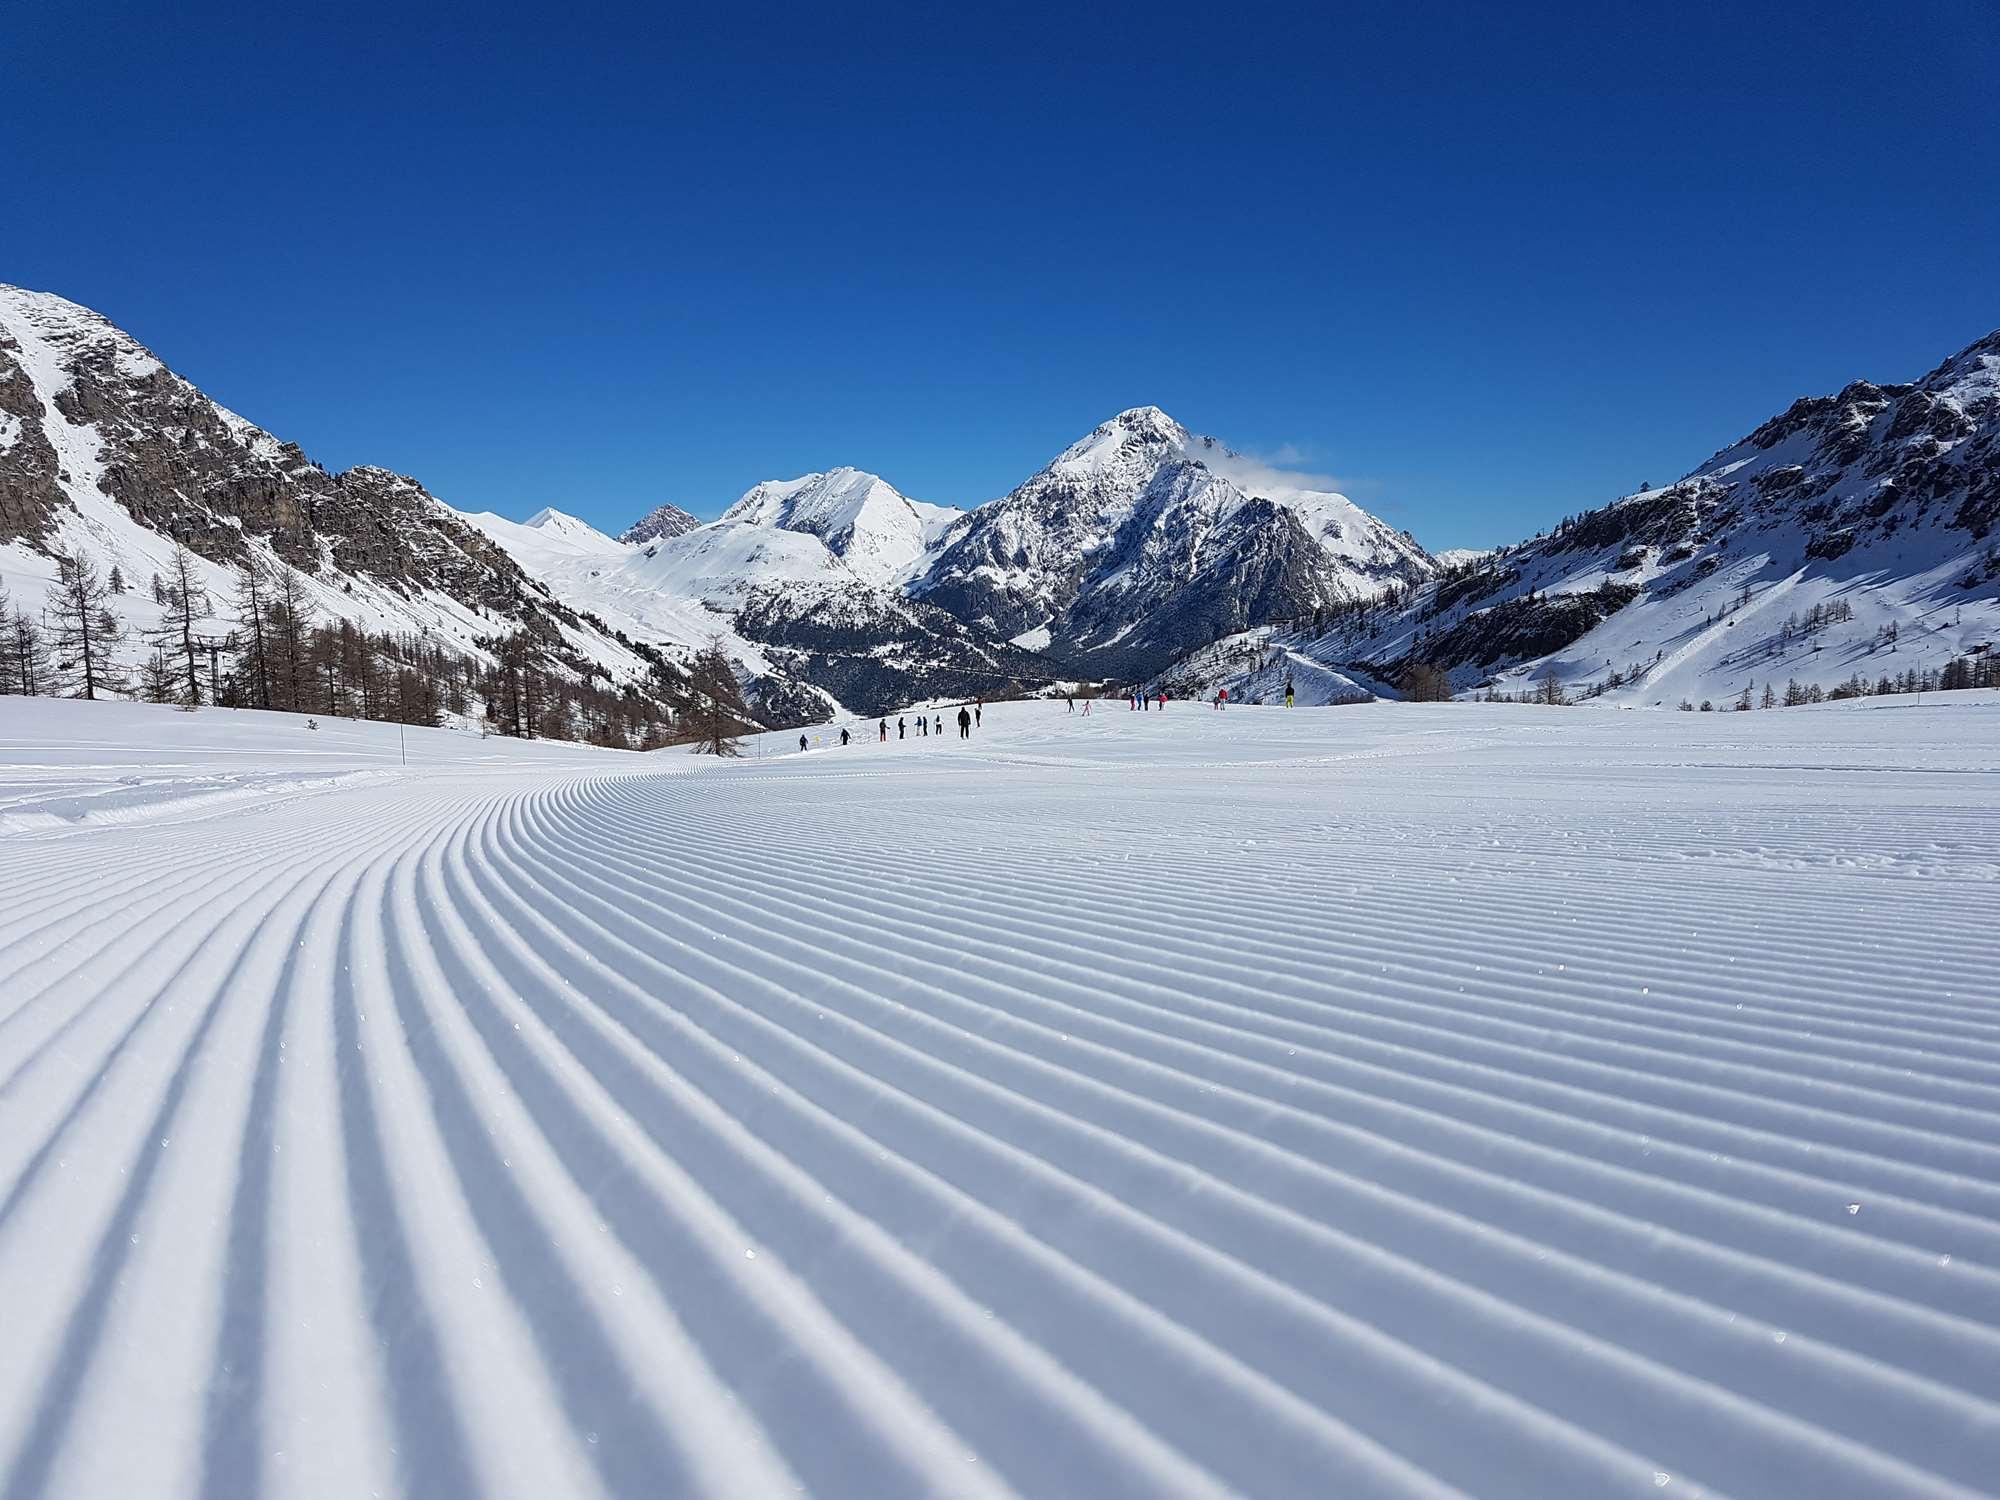 Corduroy slopes in Montgenevre